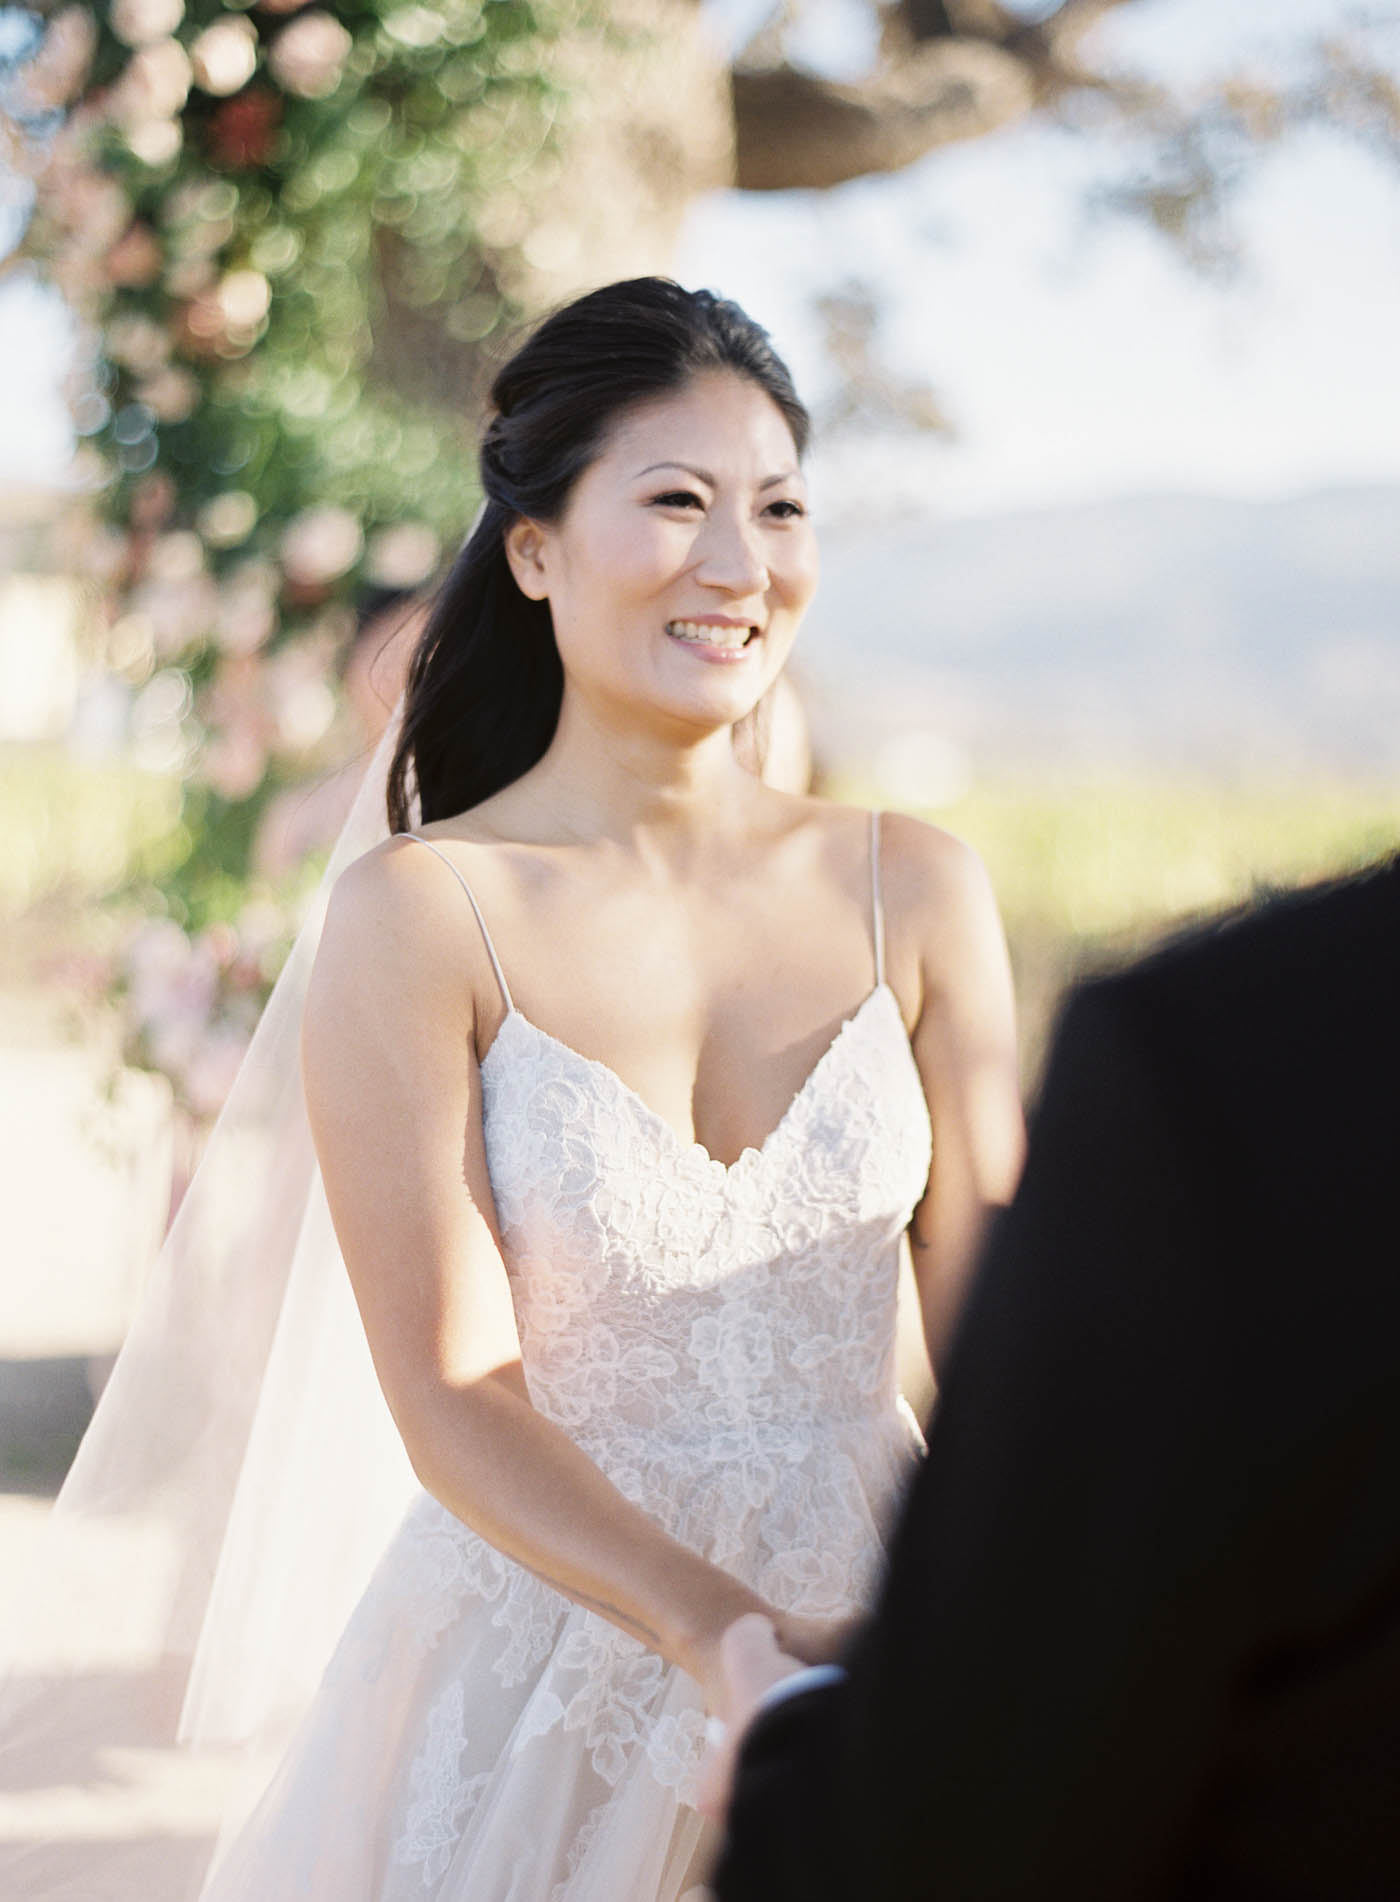 sunstone-villa-wedding-16-Jen_Huang-RD-76-Jen_Huang-009576-R1-009.jpg